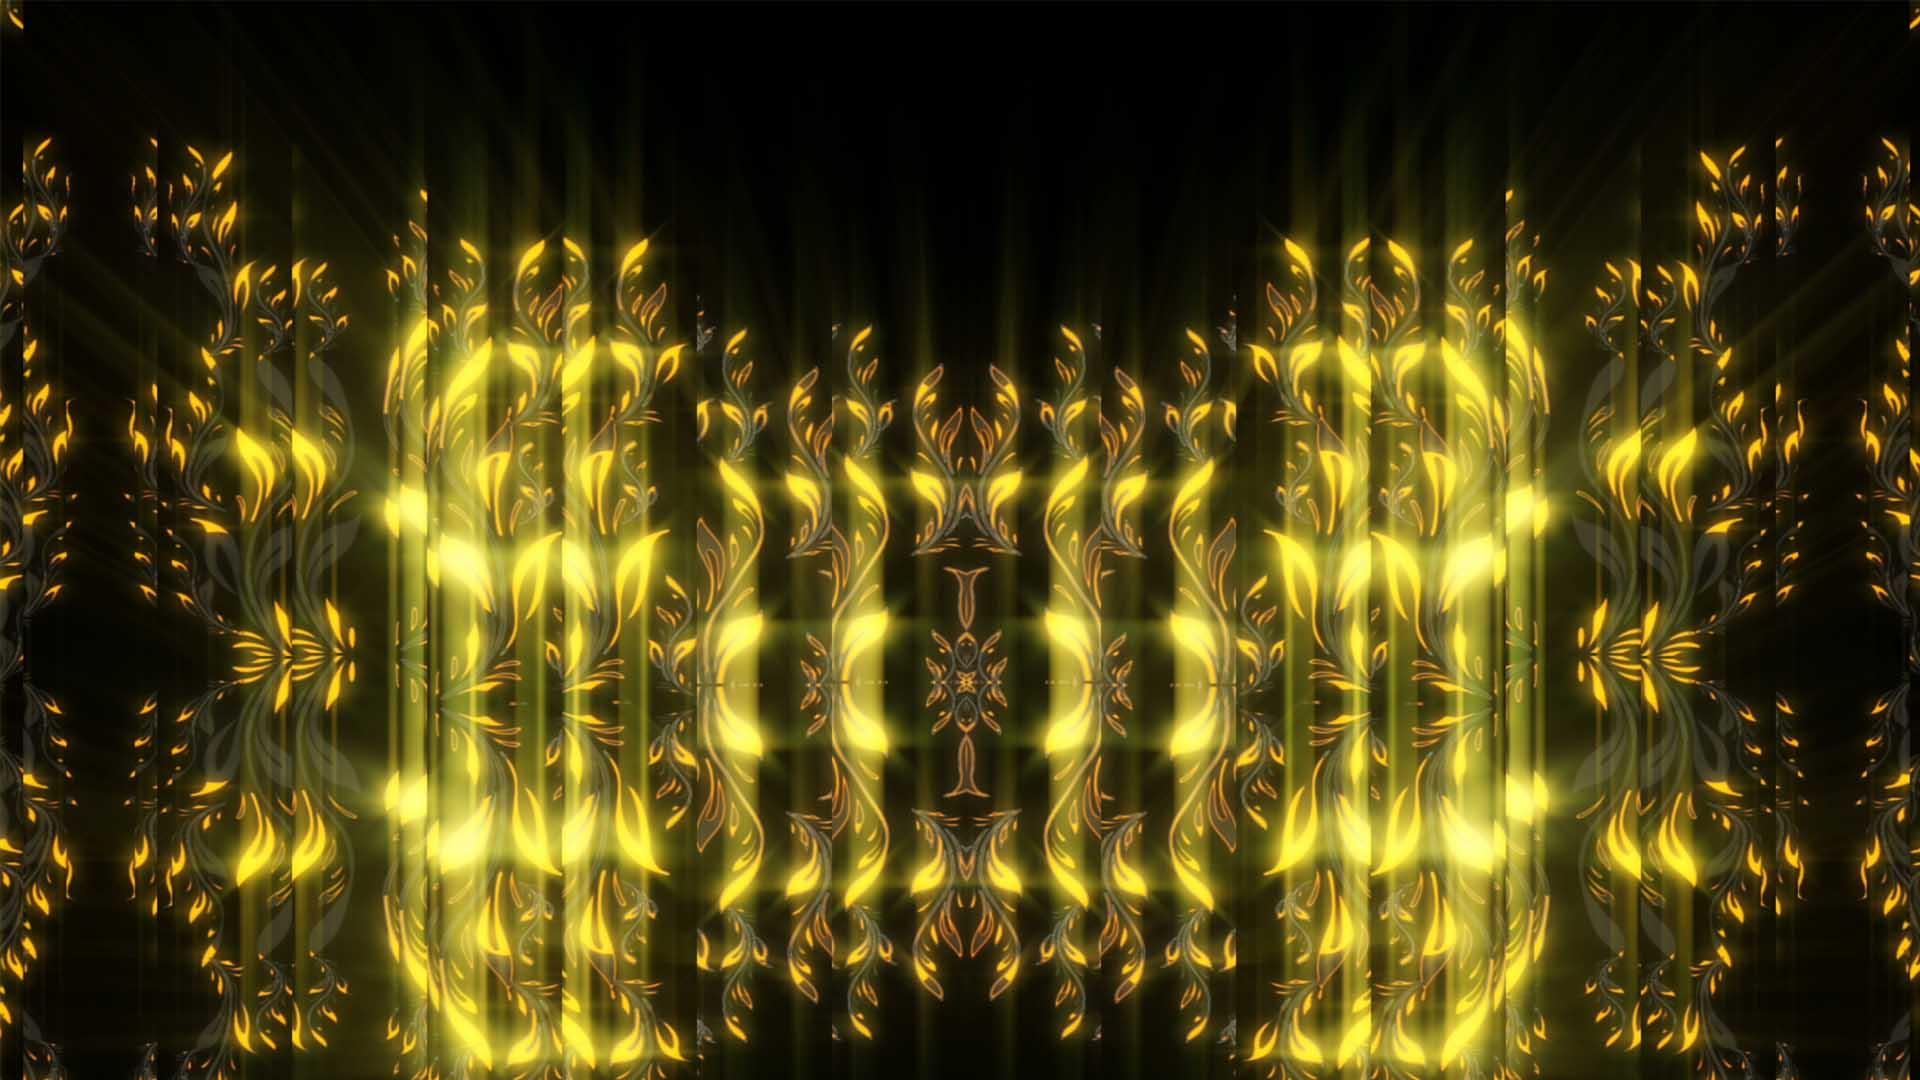 Golden_Pattern_Video_background_HD_VJ_Loop